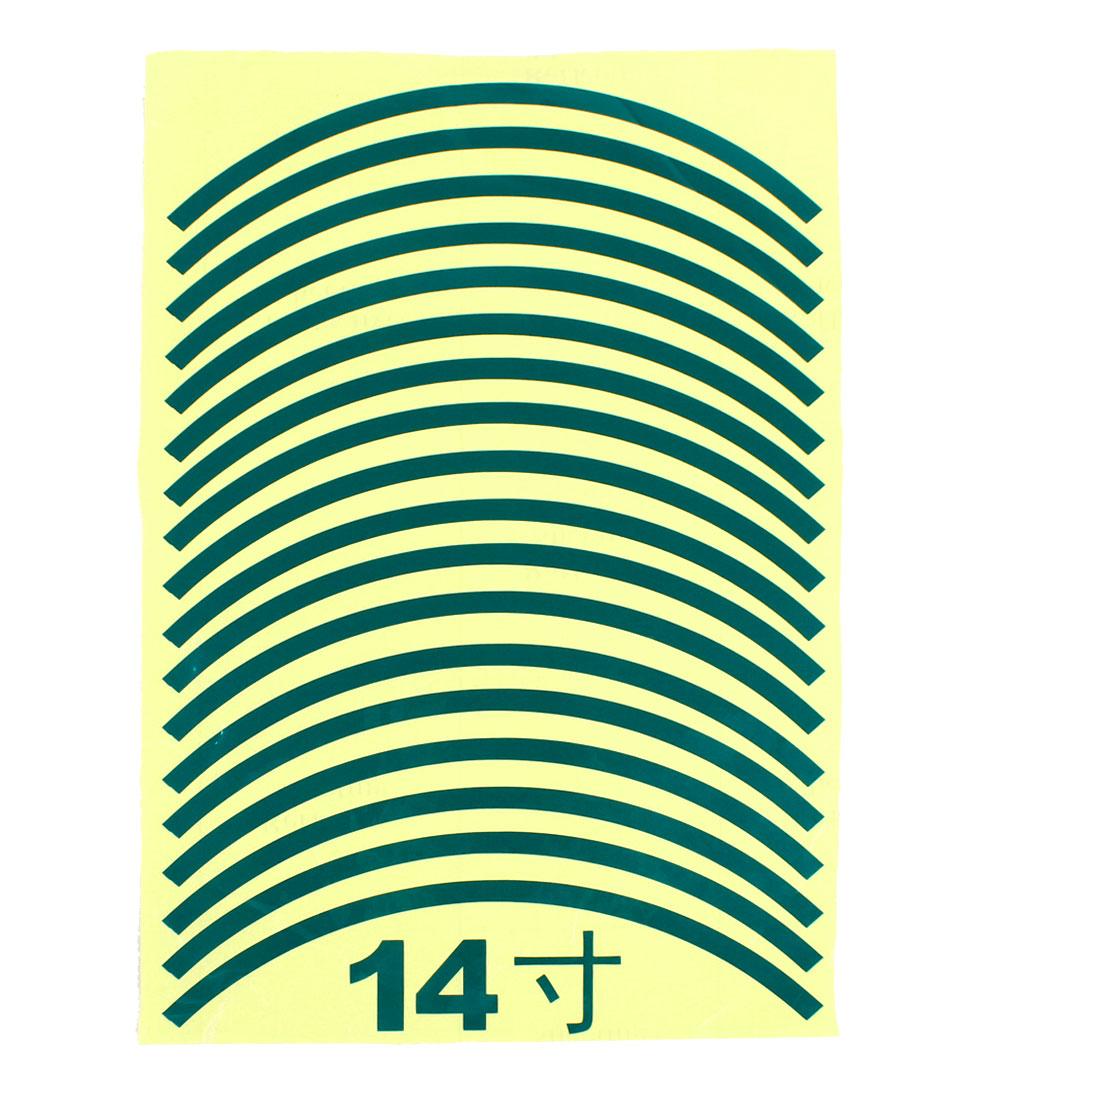 "18pcs 29.5cm Length Car Van Tire Rim Green Decorative Sticker for 14"" Wheels"